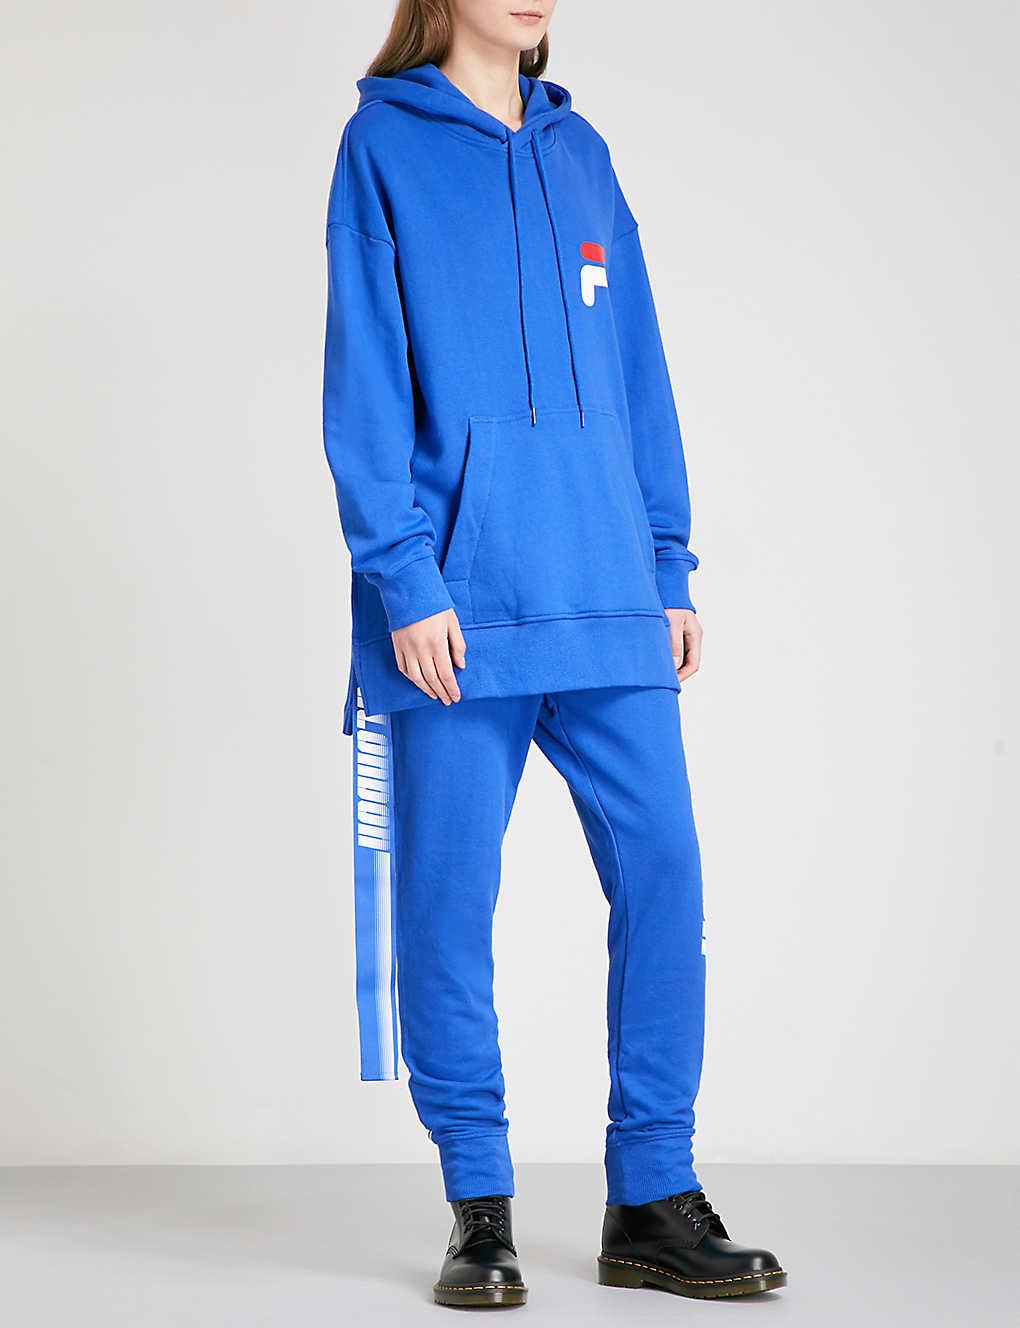 65e56084d4b56 D-ANTIDOTE - D-ANTIDOTE x Fila cotton-jersey hoody | Selfridges.com